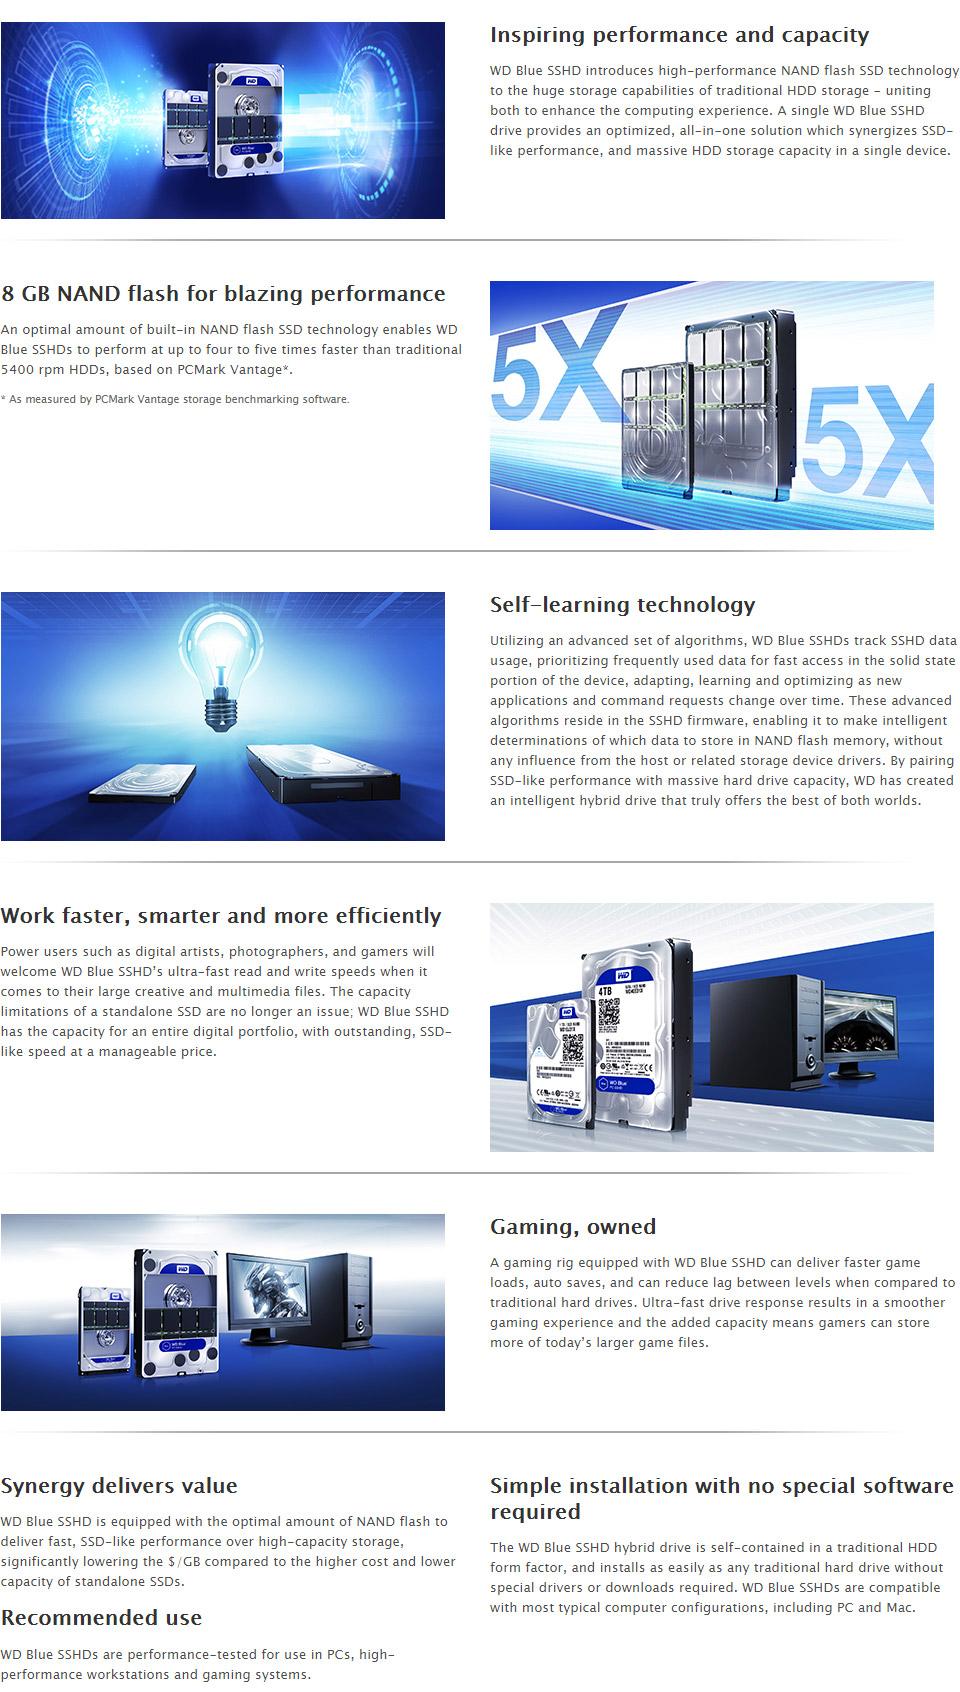 Western Digital WD Blue 4TB SSHD WD40E31X [WD40E31X] : PC